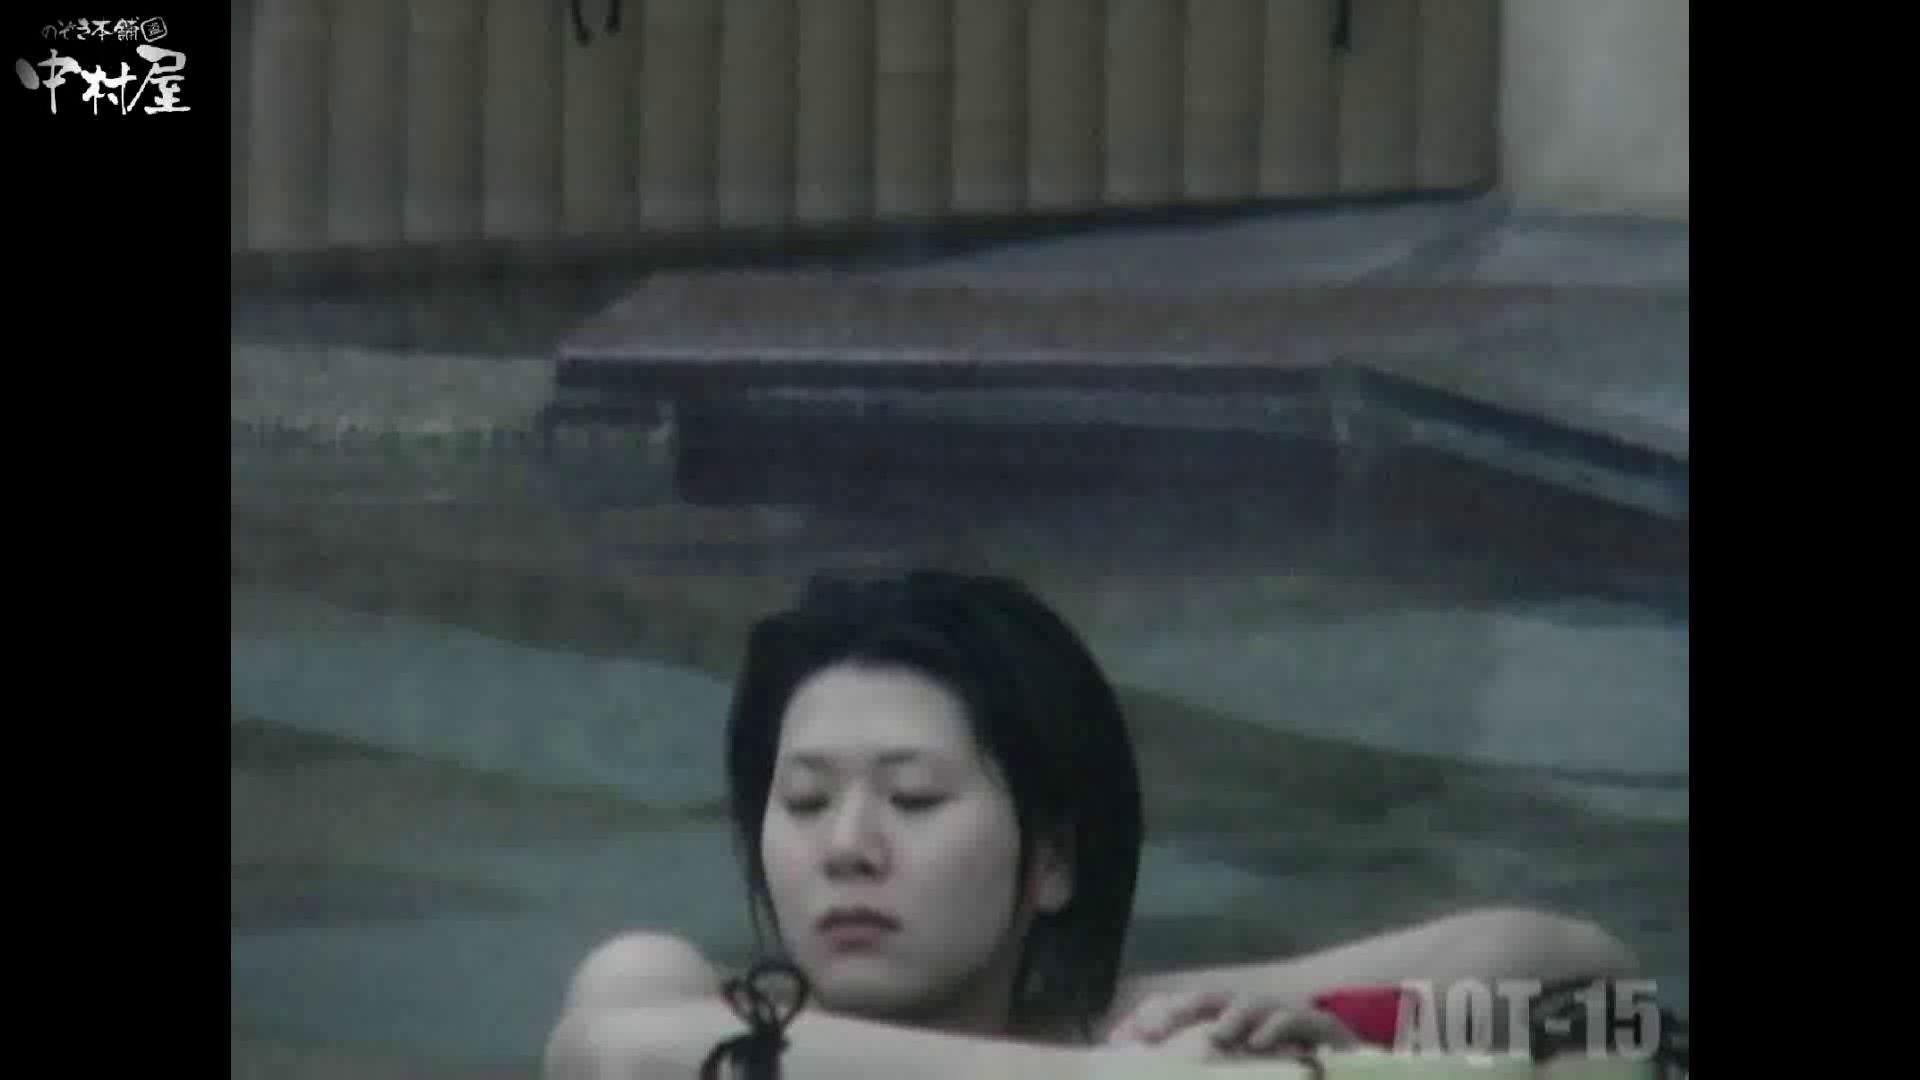 Aquaな露天風呂Vol.878潜入盗撮露天風呂十五判湯 其の七 0 | 0  66連発 45